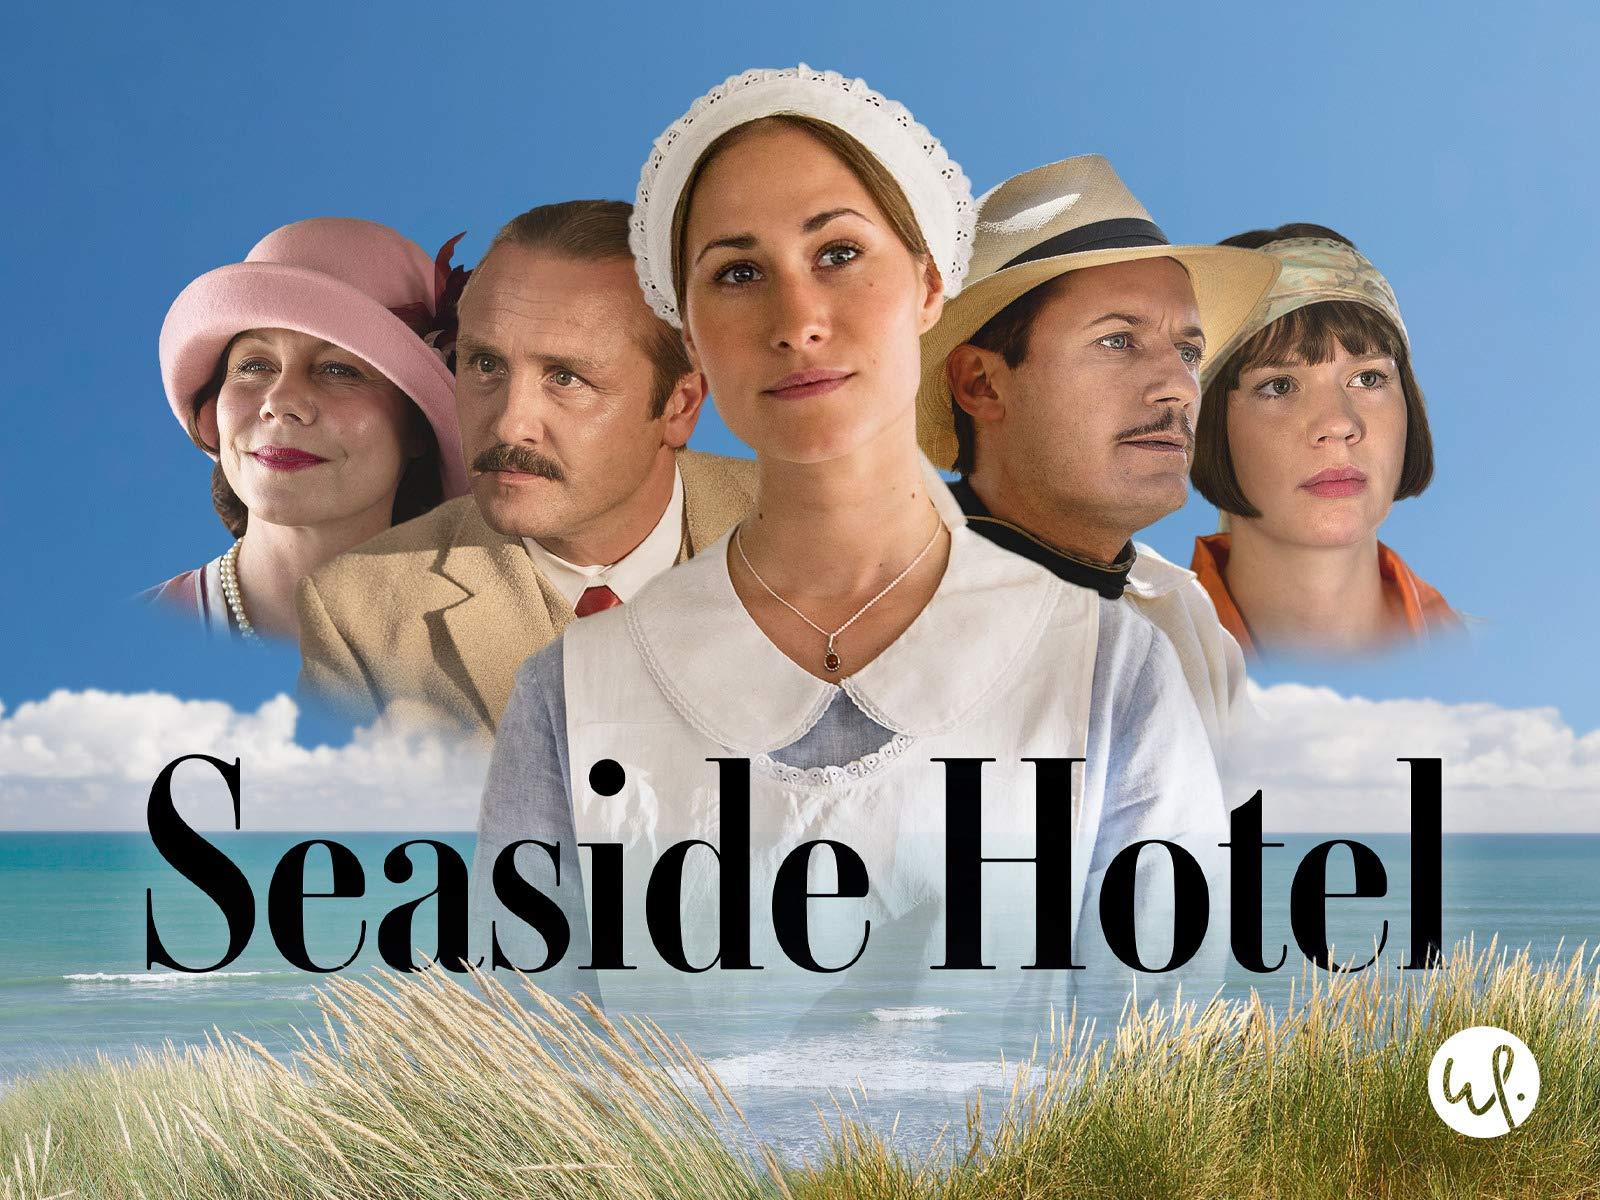 Amazon.com: Watch Seaside Hotel: Season 1 | Prime Video